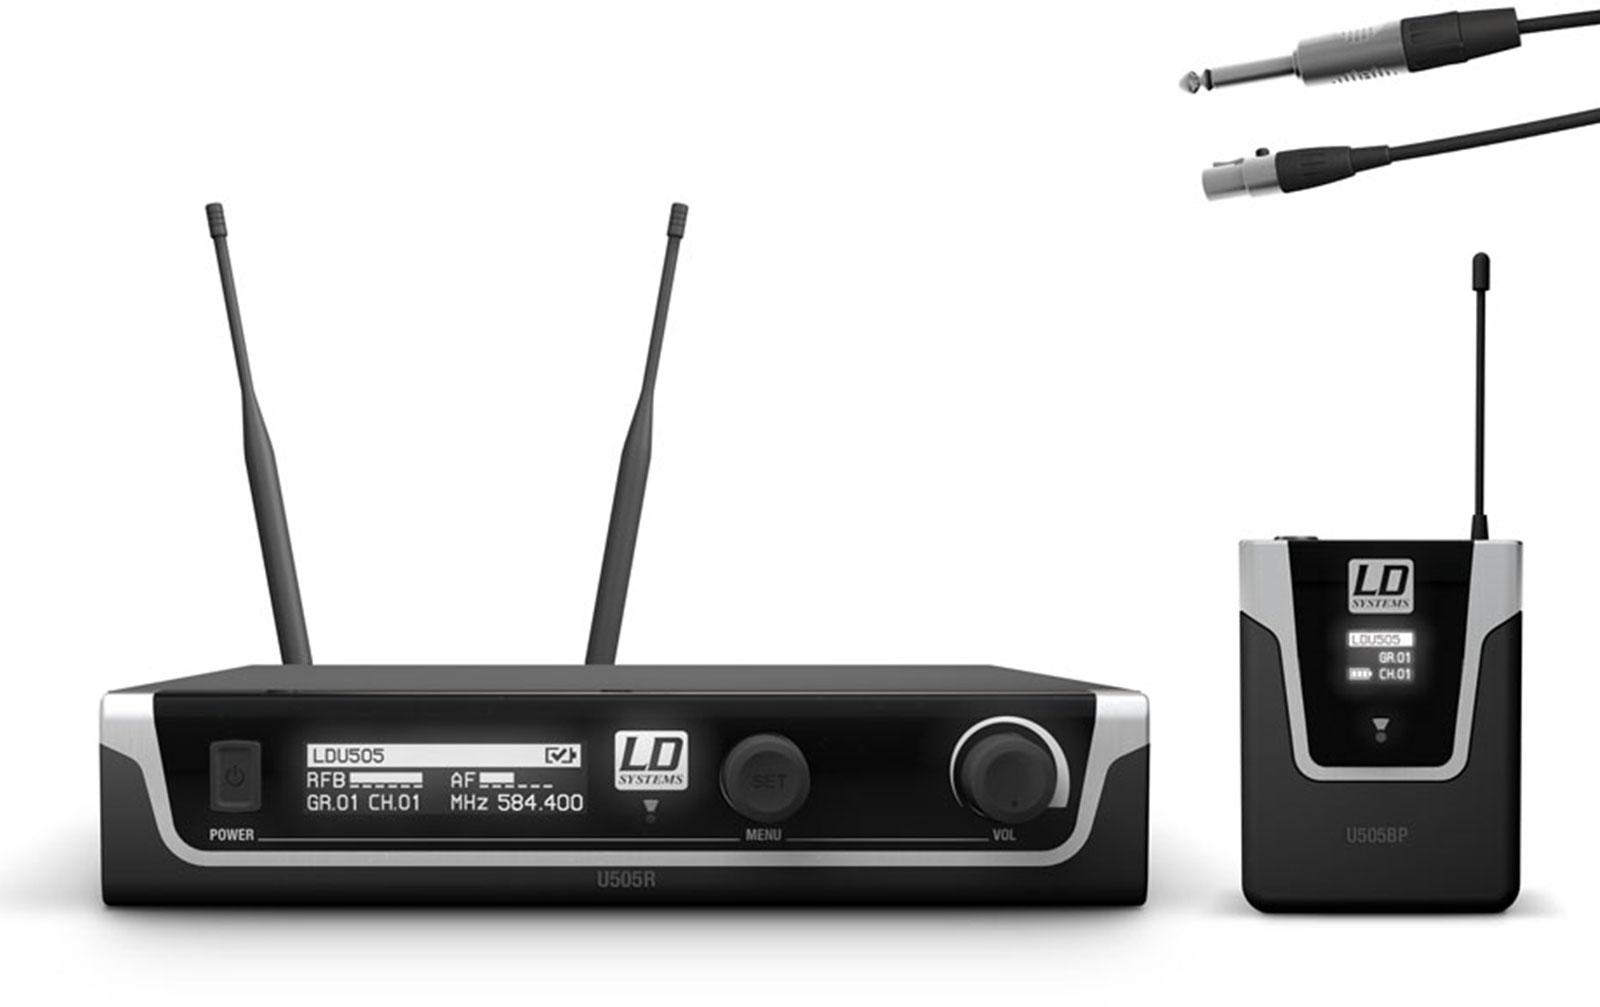 ld-systems-u505-bpg-funkmikrofon-system-mit-bodypack-und-gitarren-kabel